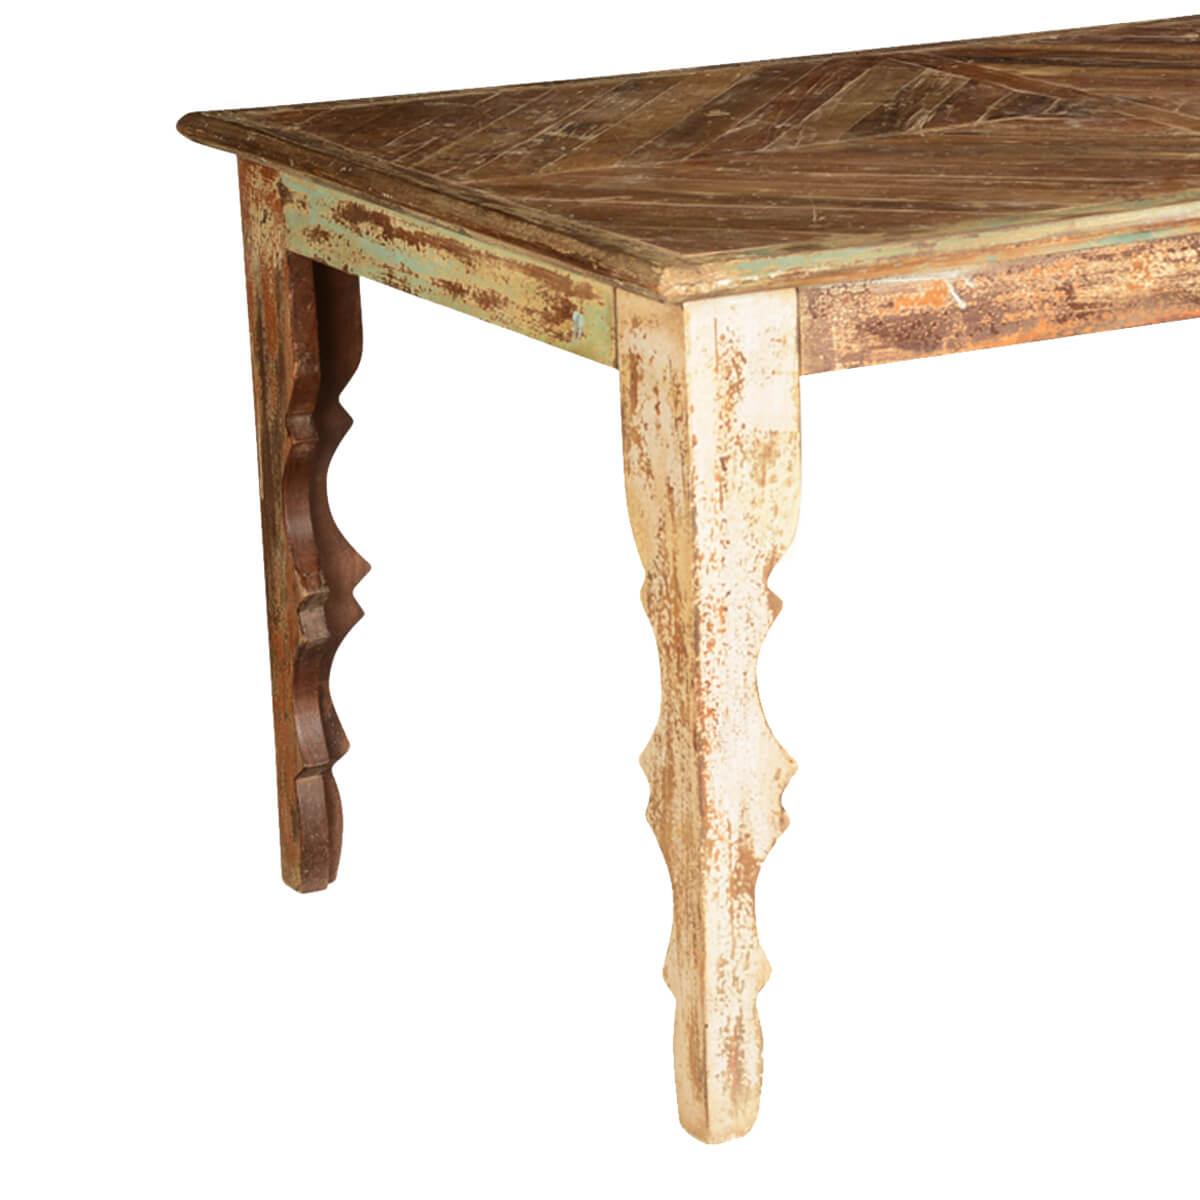 rustic parquet mango wood dining table w v shaped legs. Black Bedroom Furniture Sets. Home Design Ideas